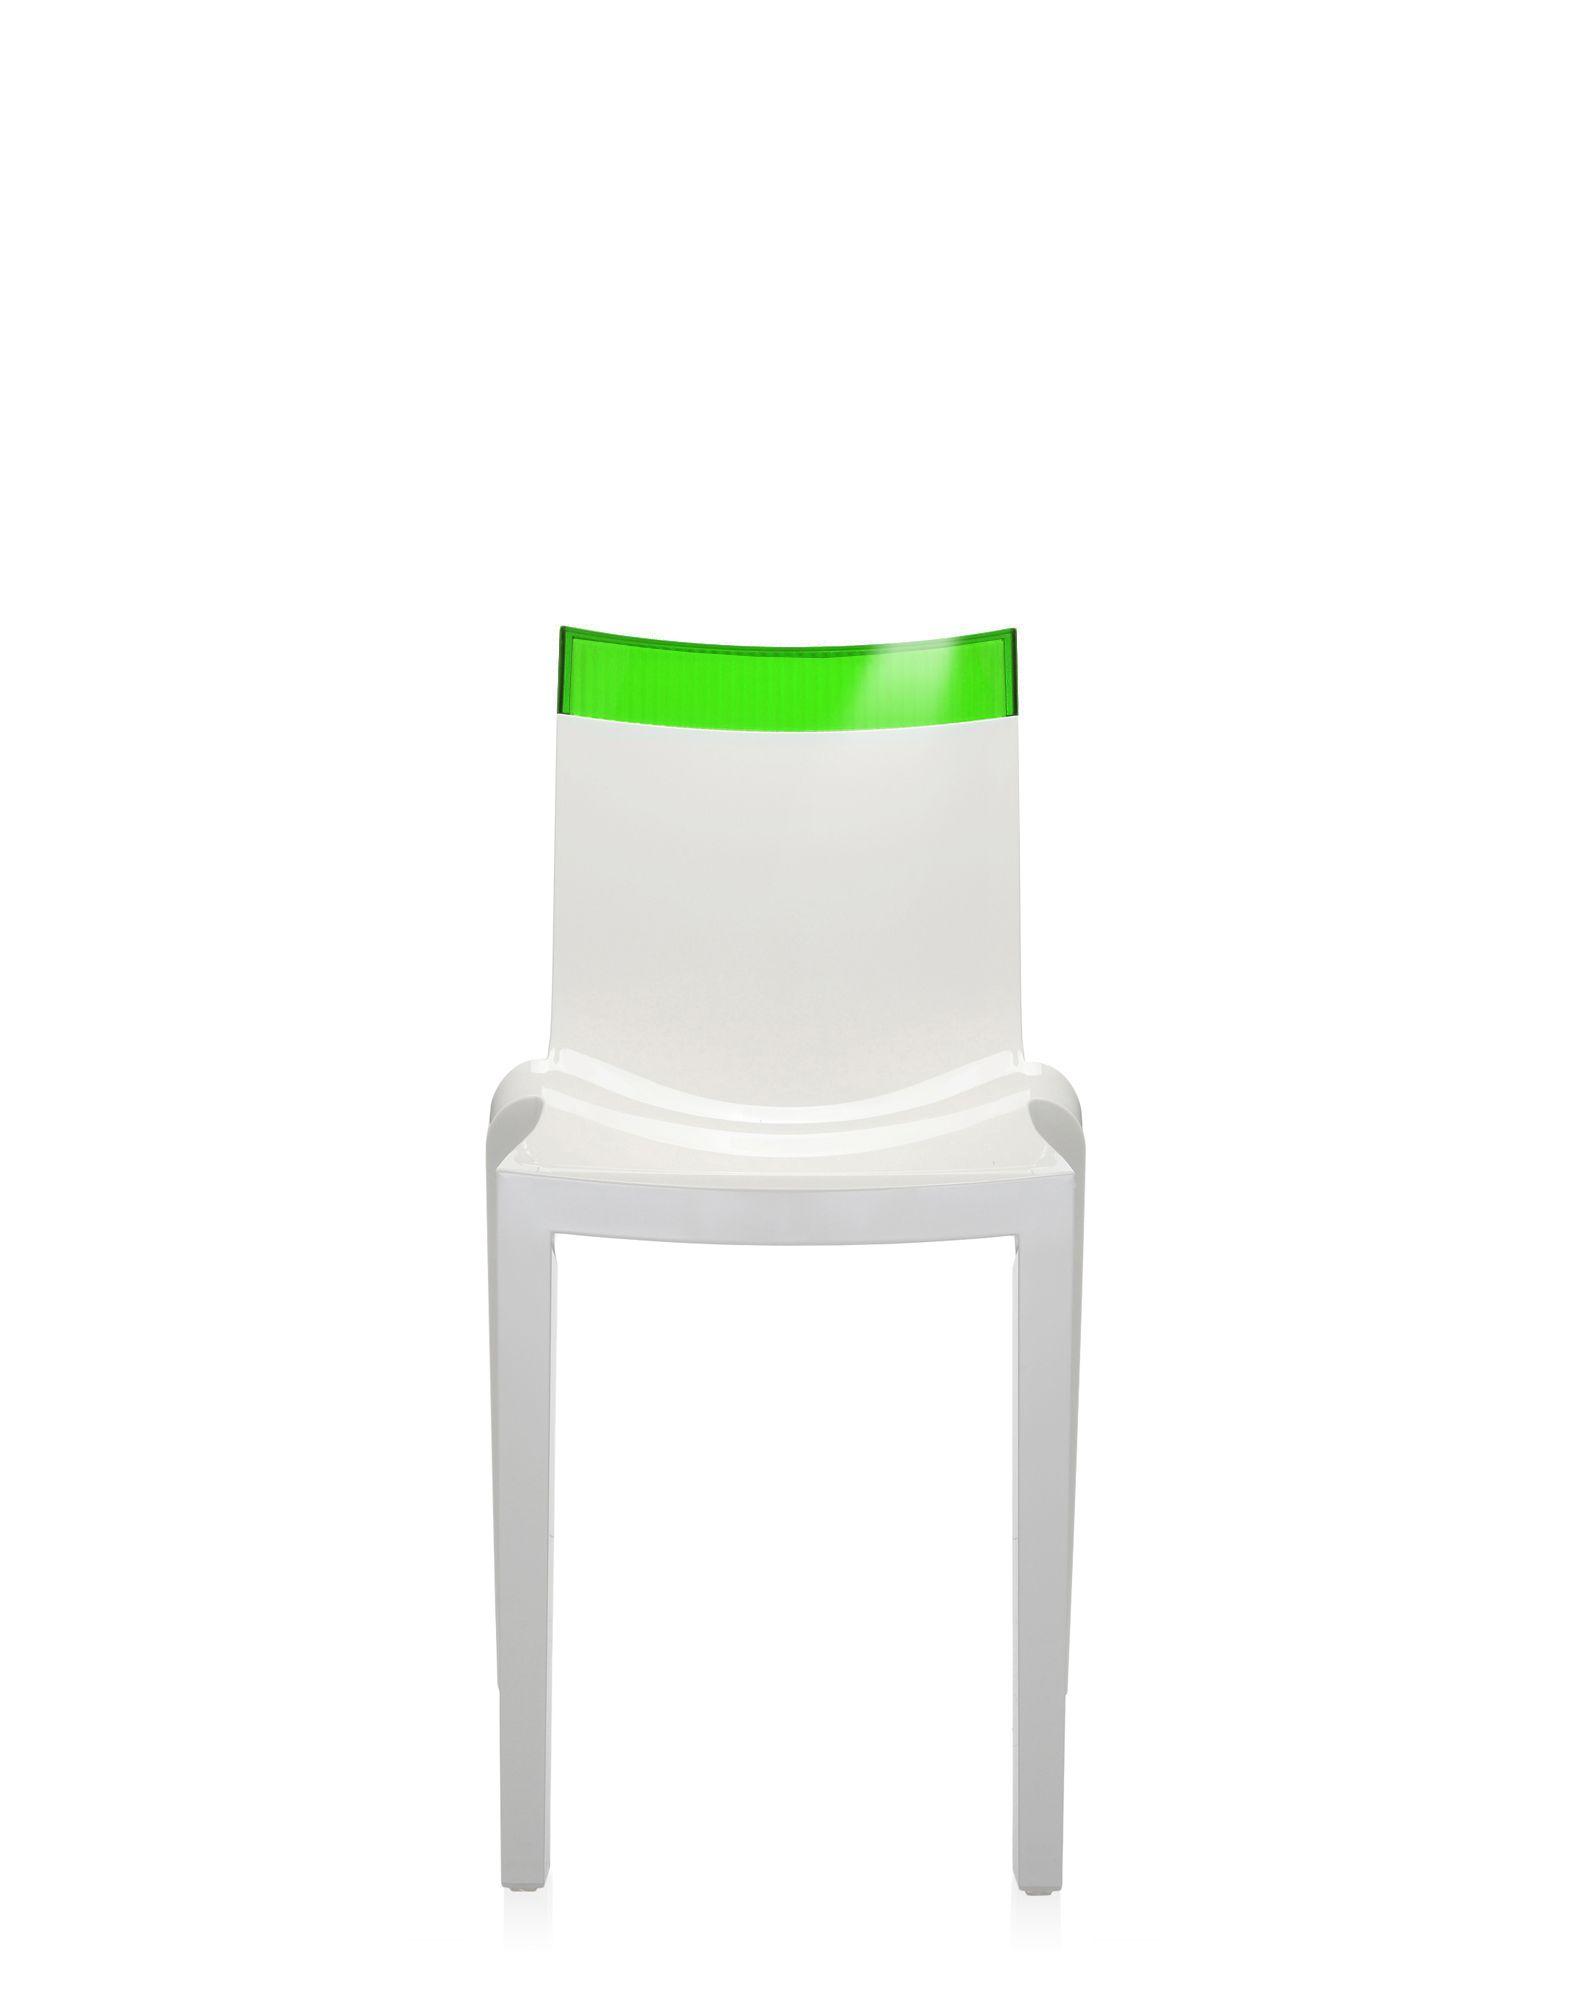 Sgabelli Kartell One More Prezzo.Kartell Hi Cut Green White Design Chairs Newformsdesign